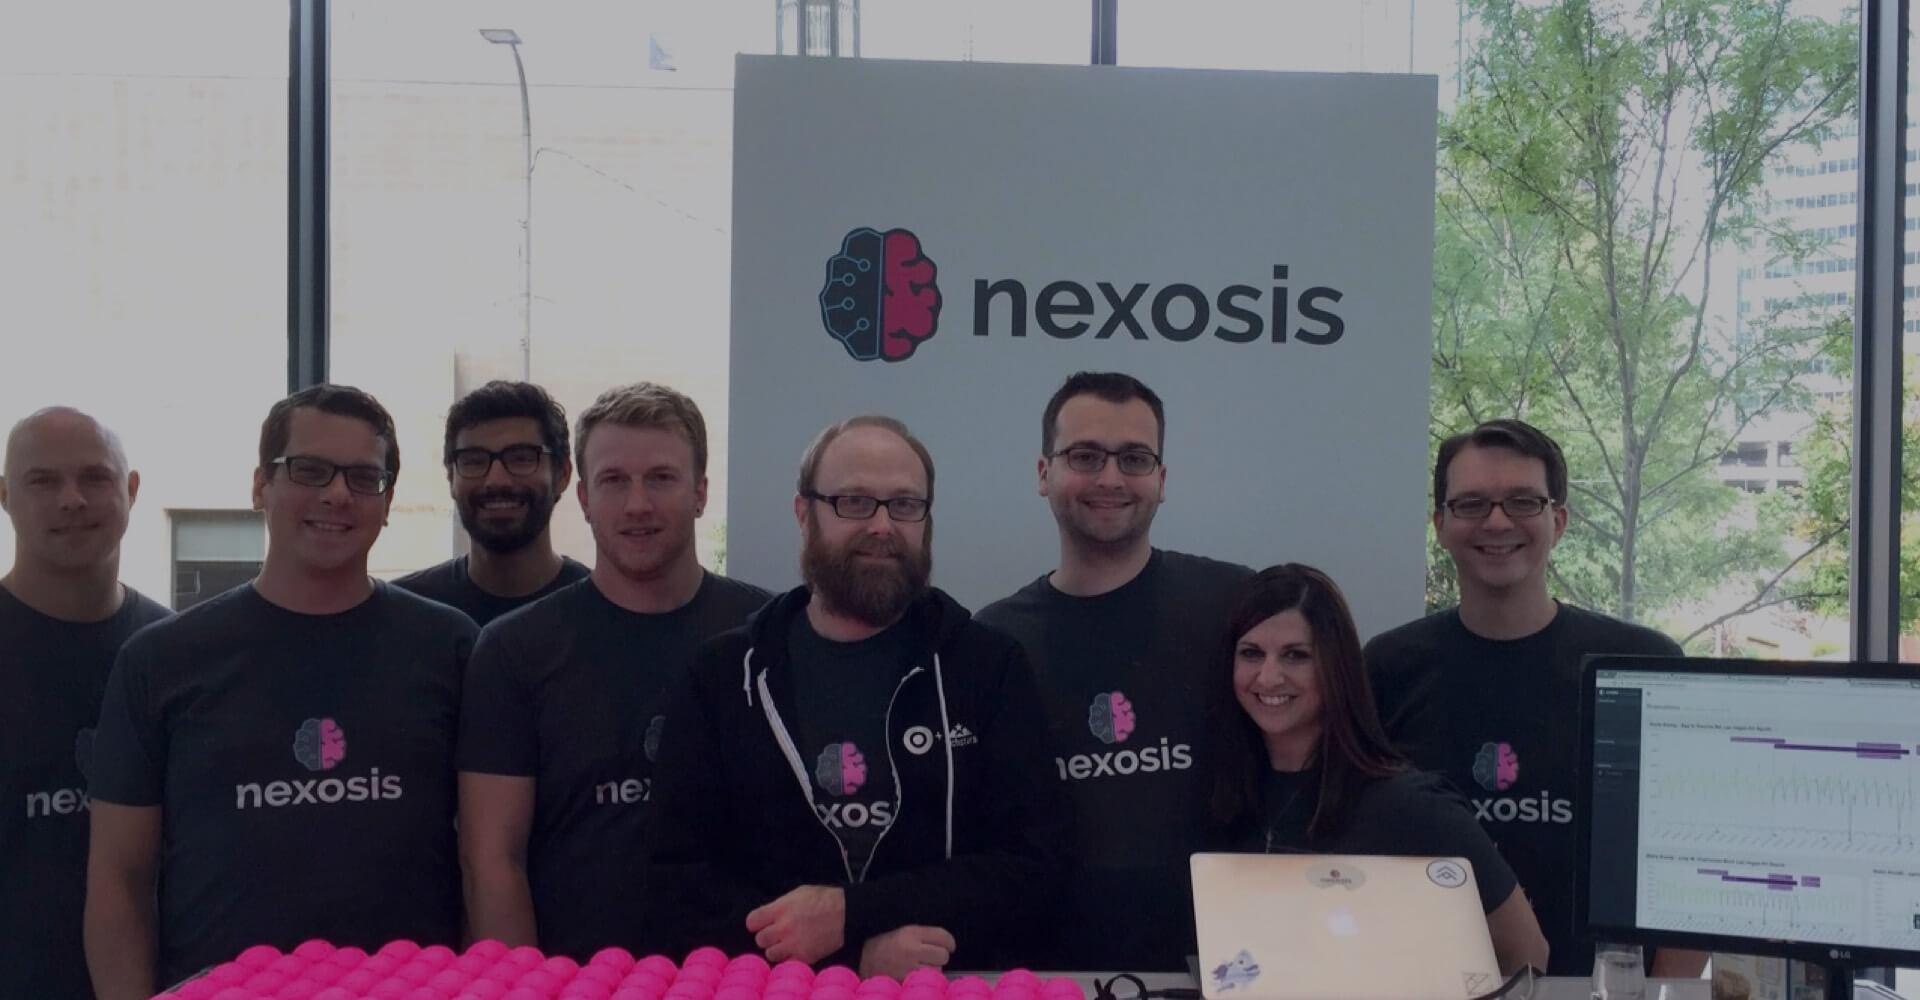 nexosis eol